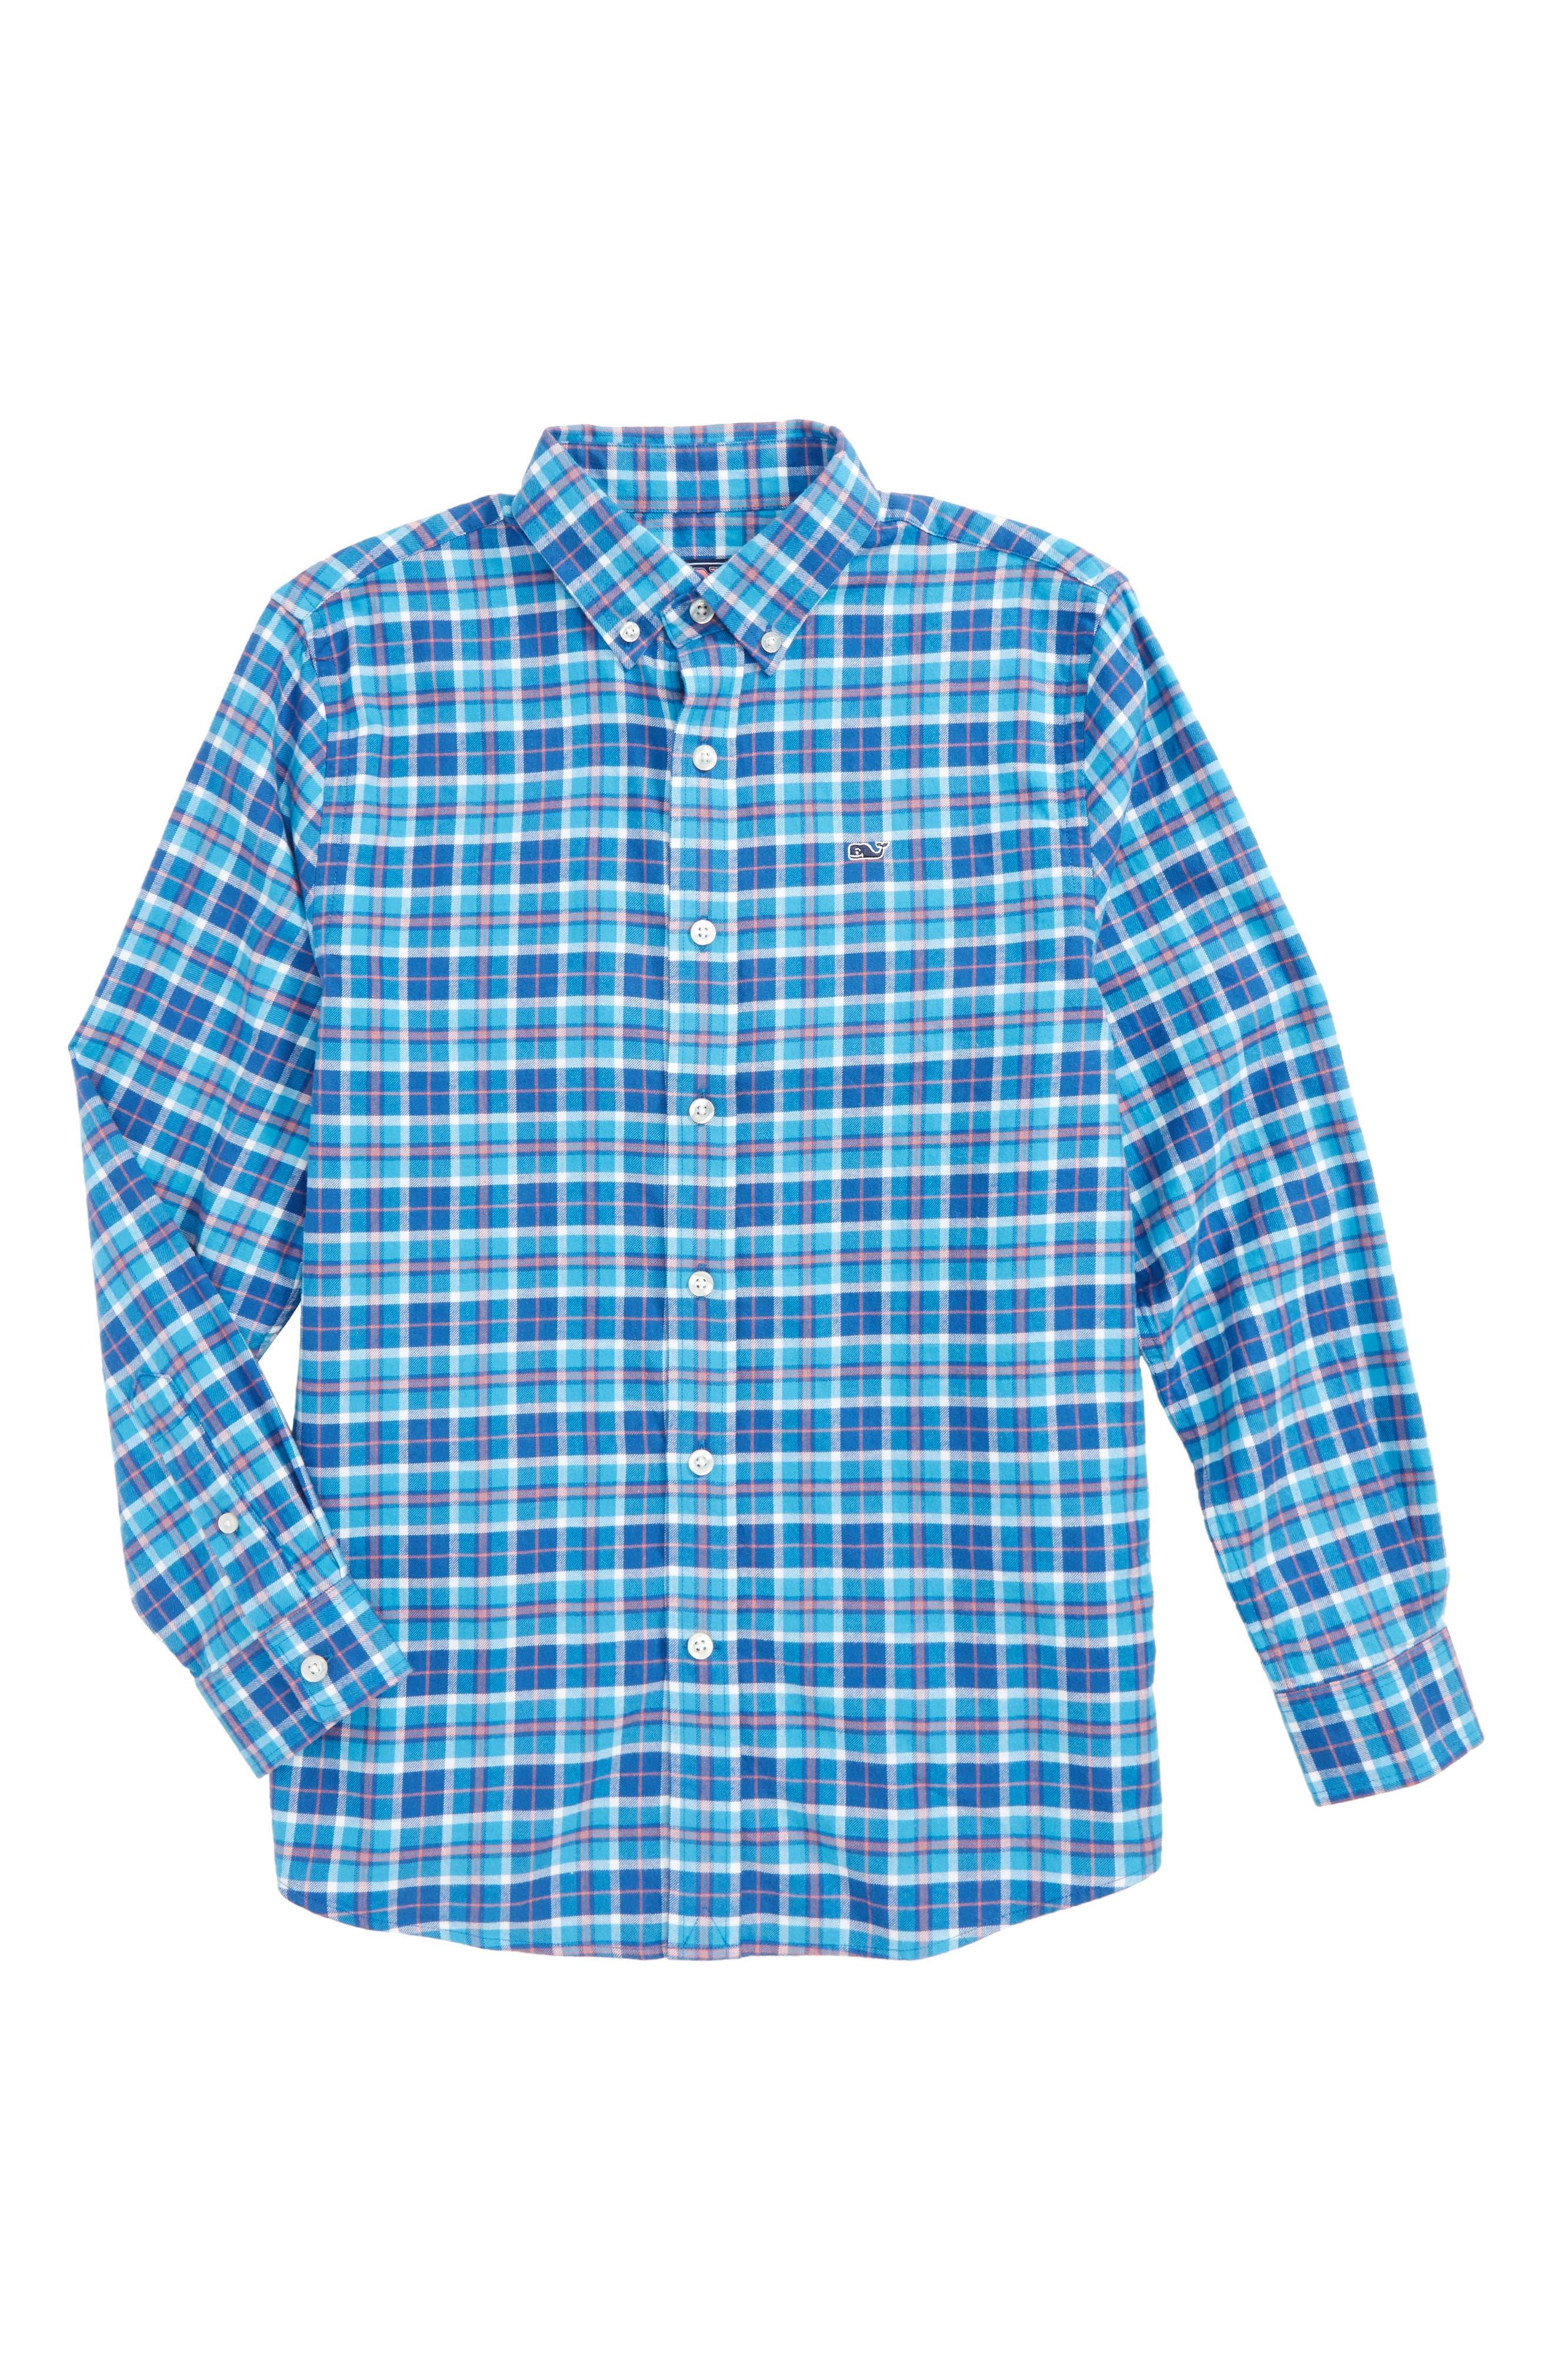 Plaskett Creek Plaid Whale Shirt,                         Main,                         color, 496